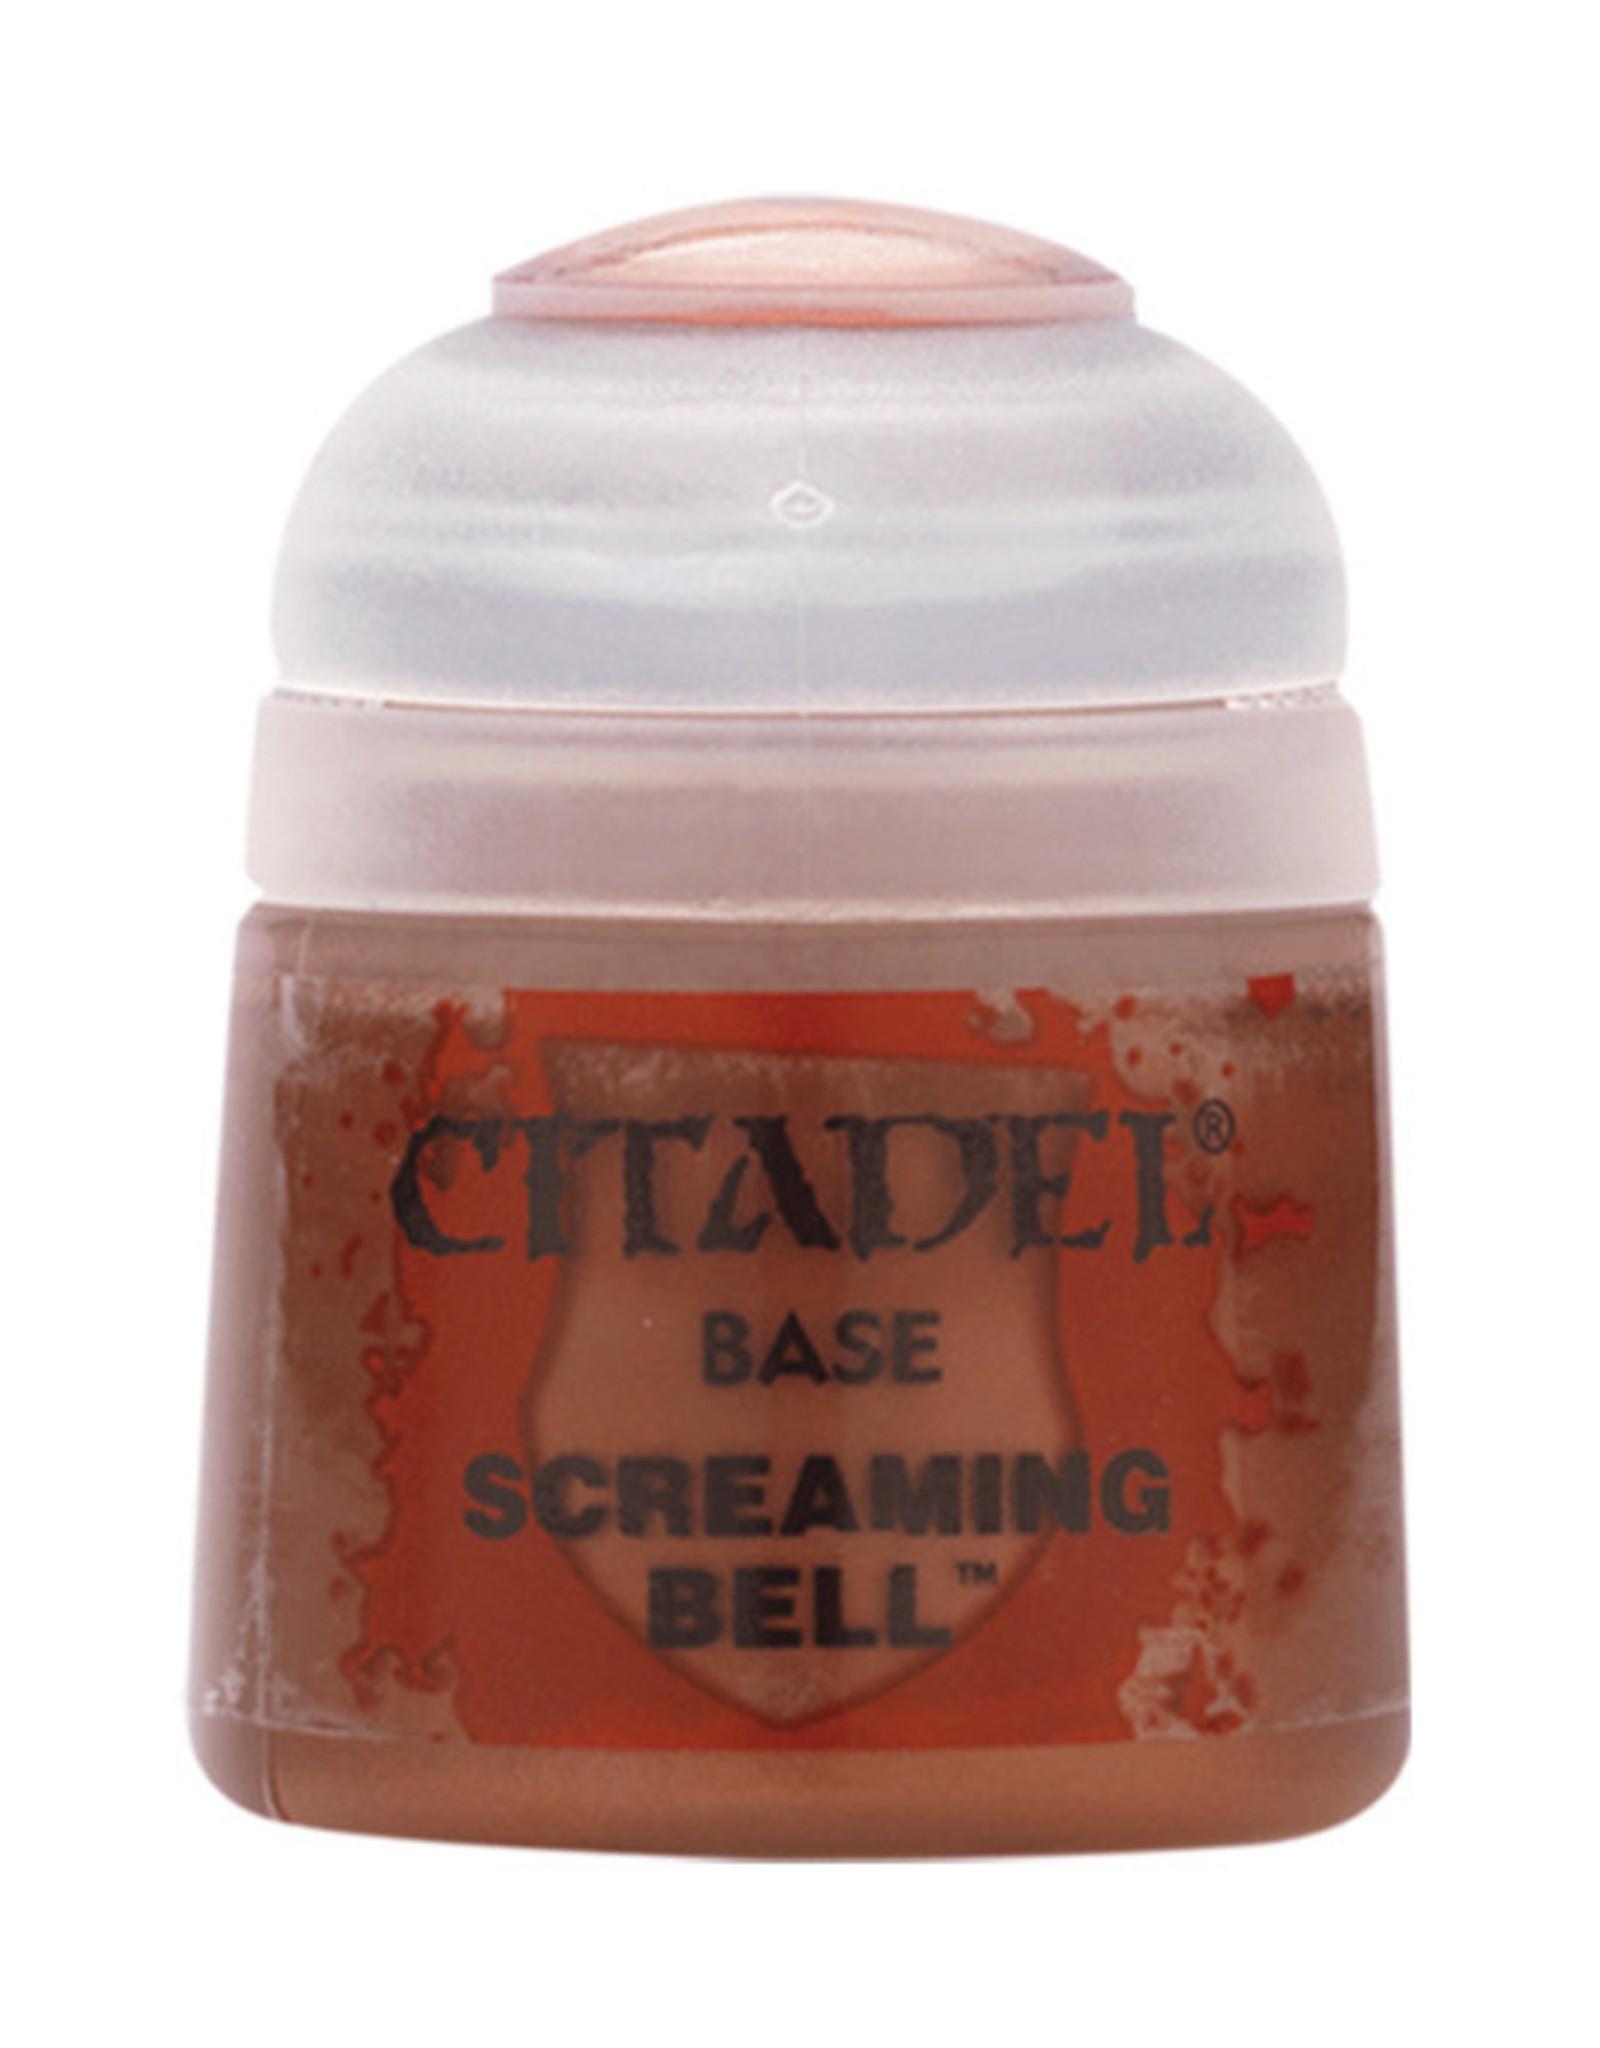 Citadel Citadel Colour: Base - Screaming Bell